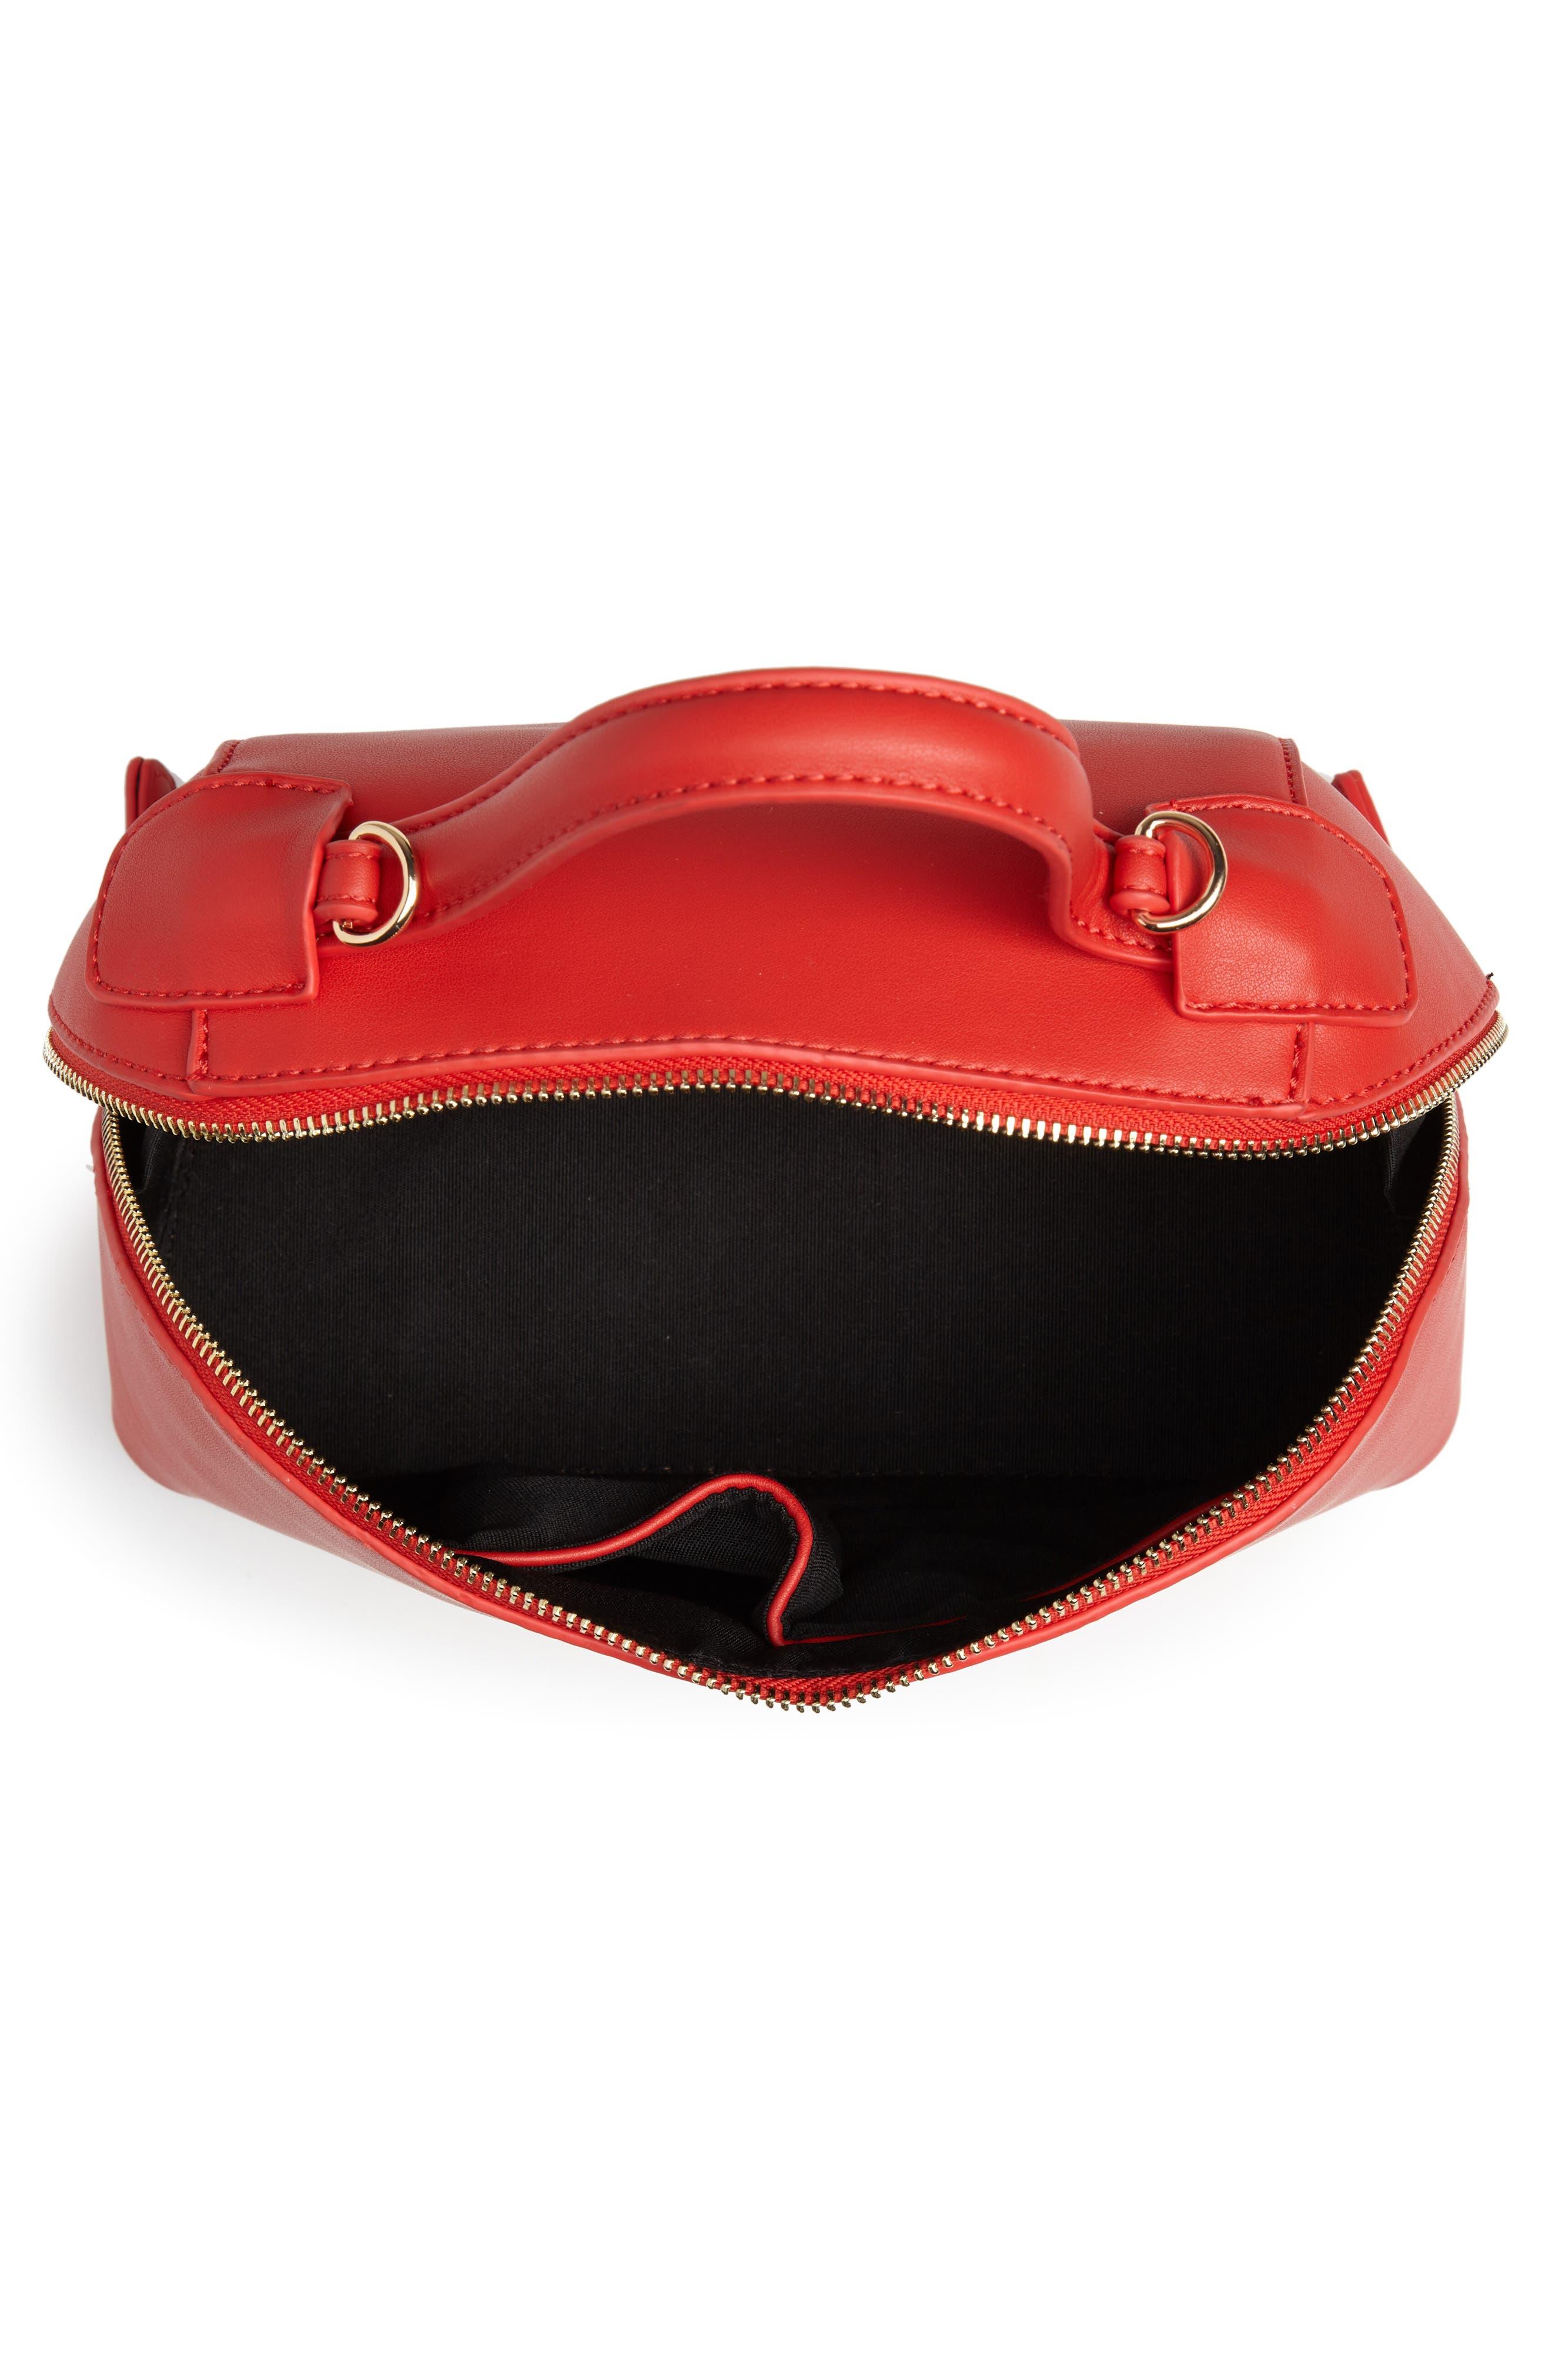 Top Handle Crossbody Bag,                             Alternate thumbnail 4, color,                             600